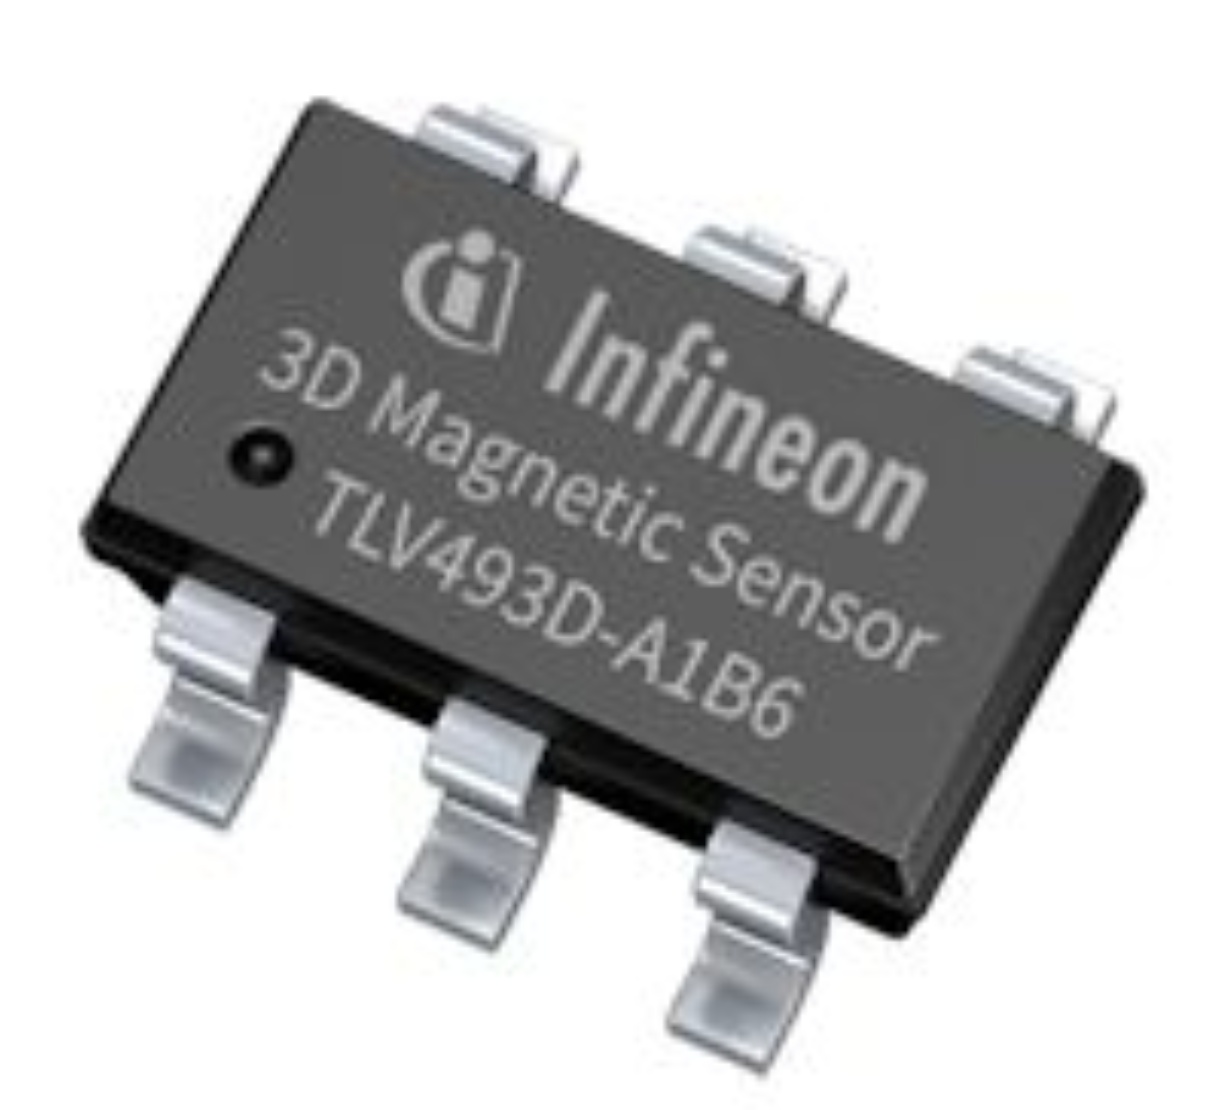 Tlv493d A1b6 Infineon Technologies Geomagnetic Field Detector Circuit 01 00 2016 02 03 Pdf 1001 Kb